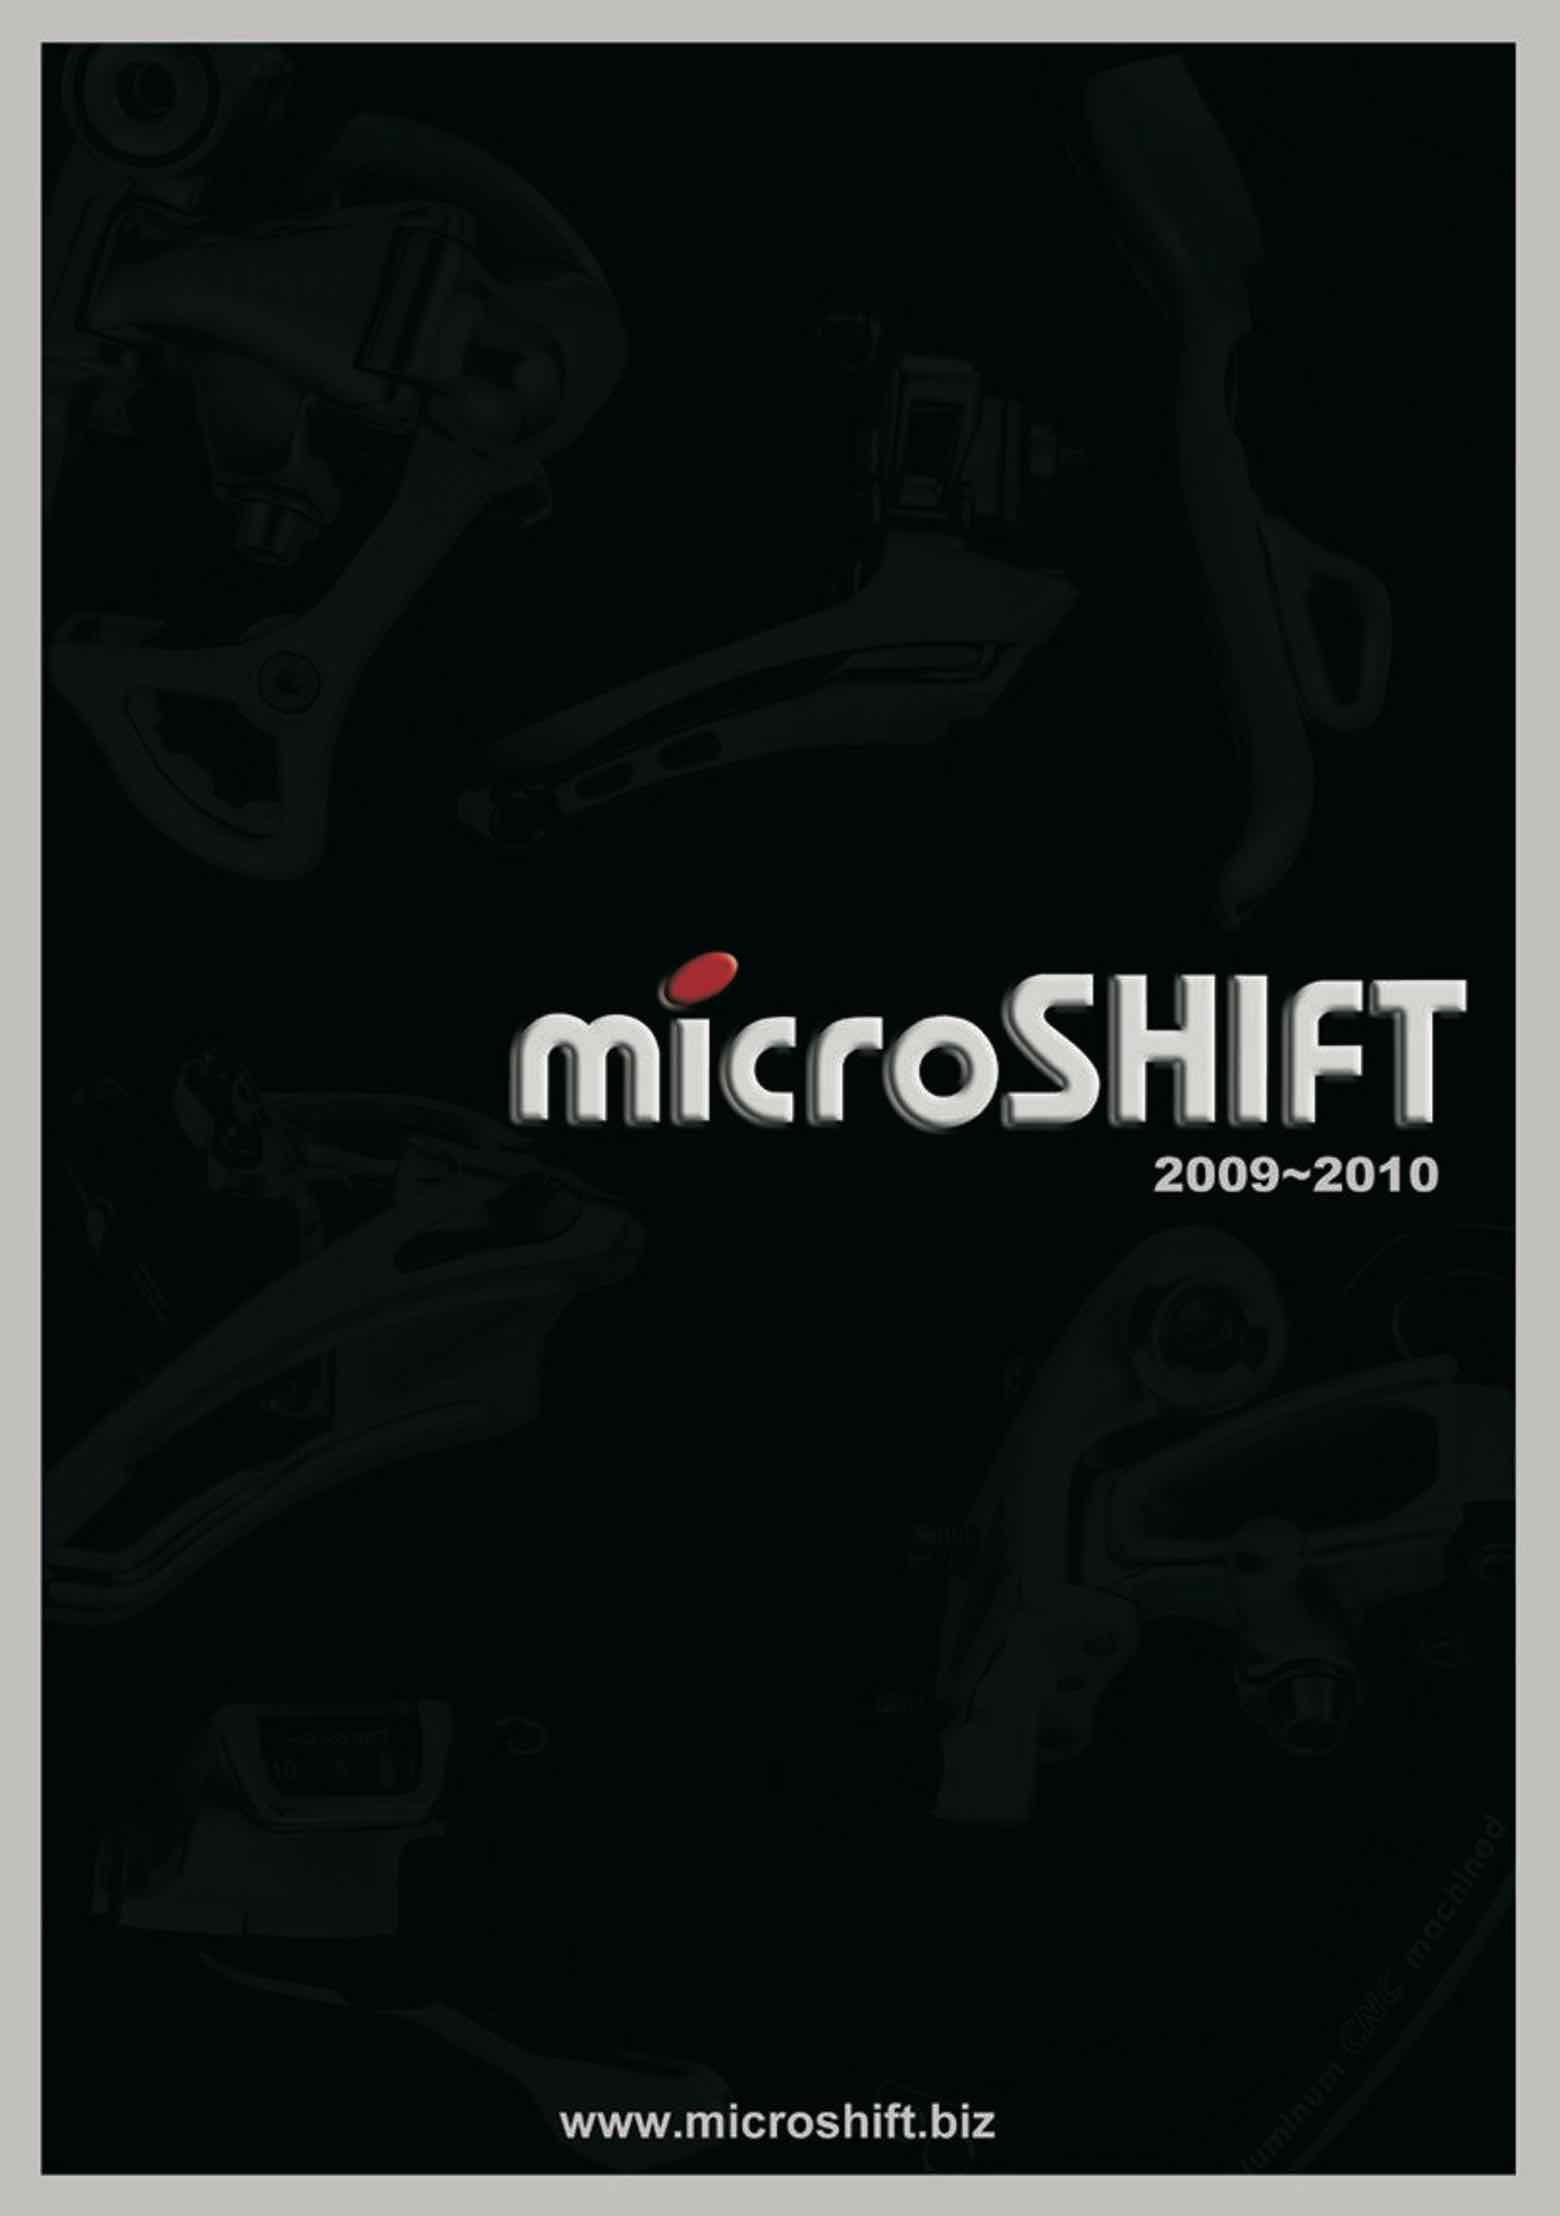 Incroyable MicroSHIFT Catalogue   2009 2010 Scan 1 Main Image